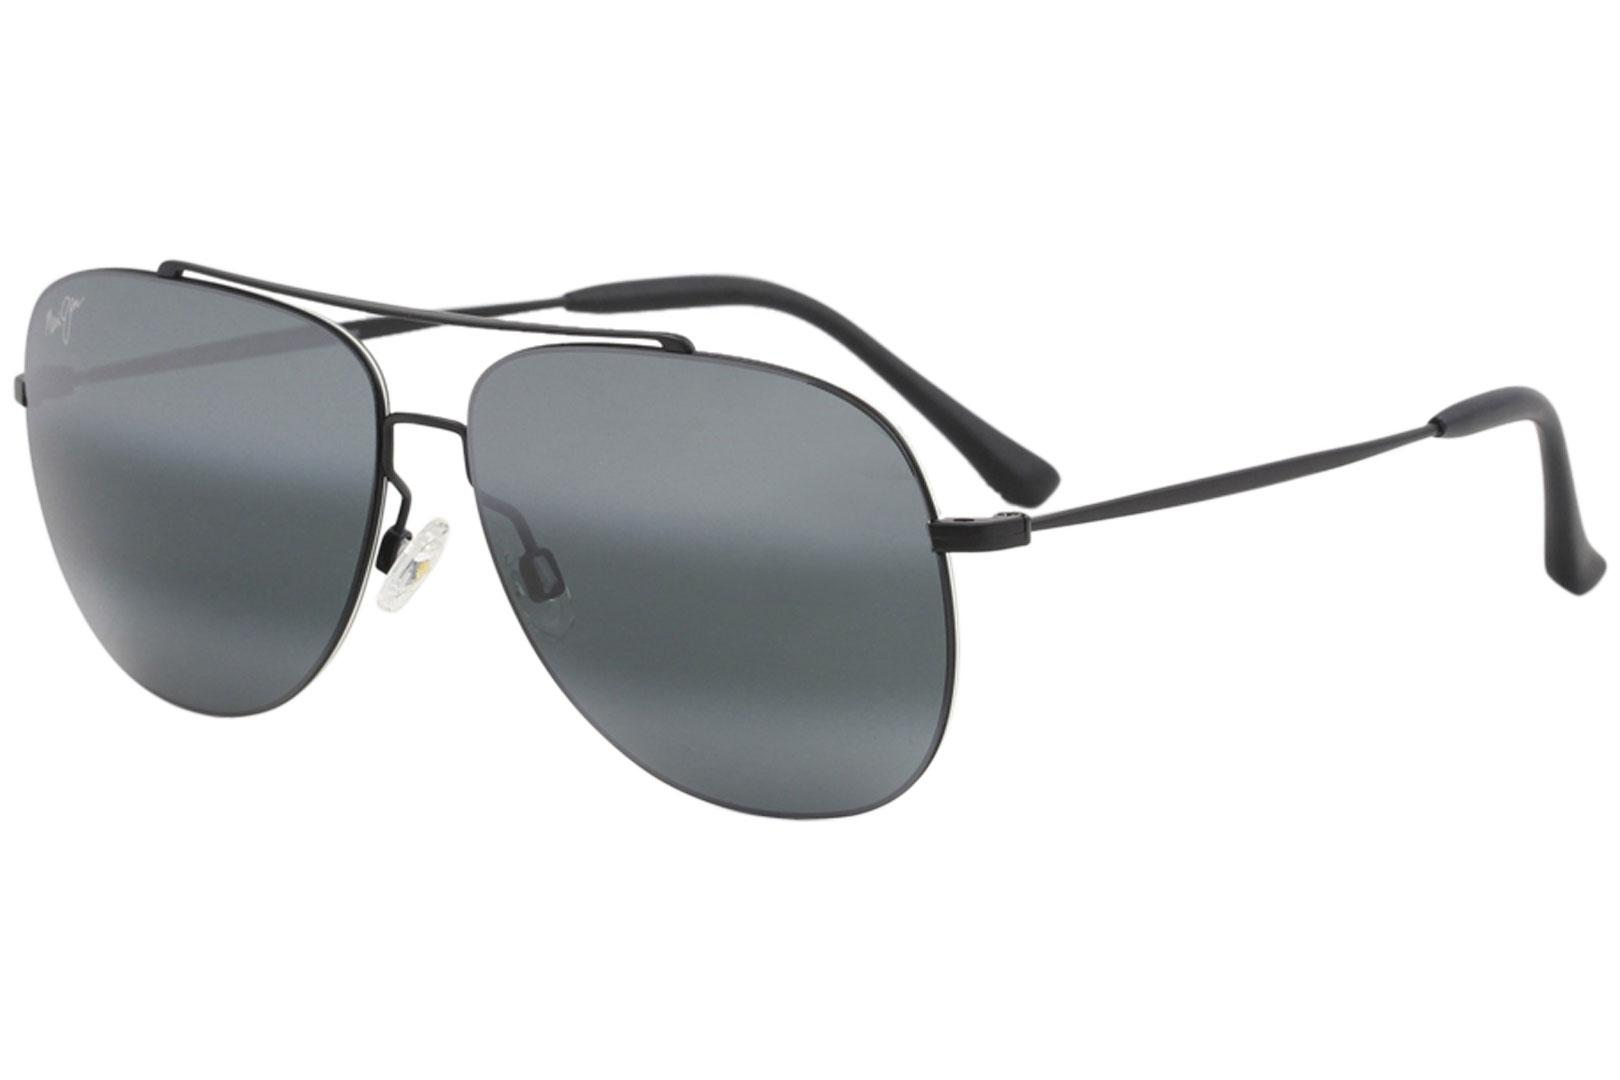 f0dba03e44 Maui Jim Men s Cinder-Cone MJ789 MJ 789 Fashion Pilot Polarized Sunglasses